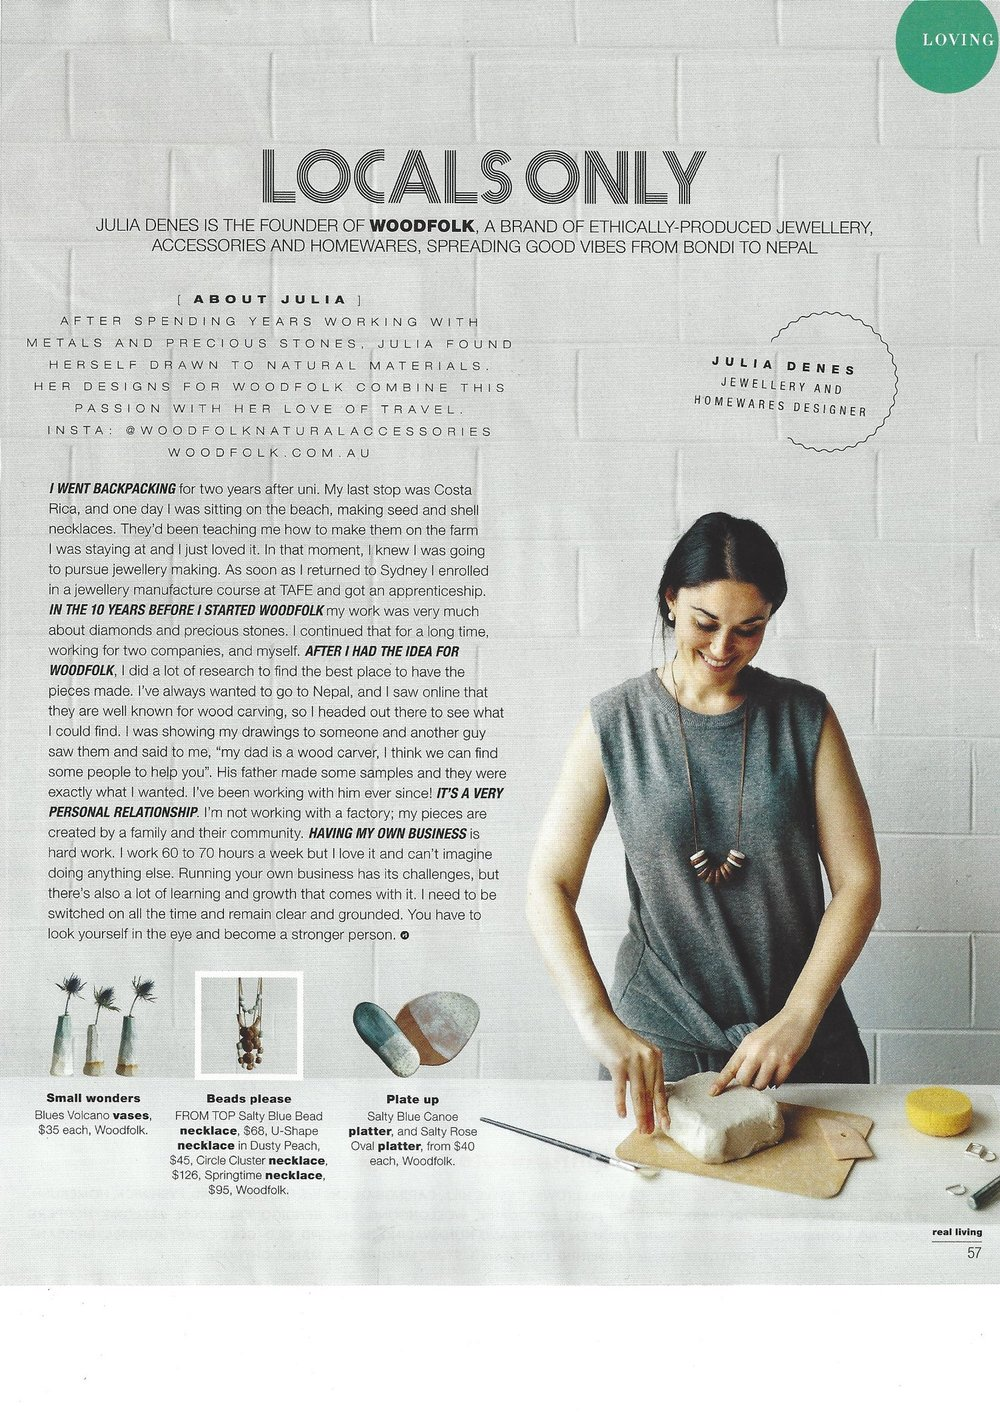 Woodfolk in Real Living magazine, December 2016